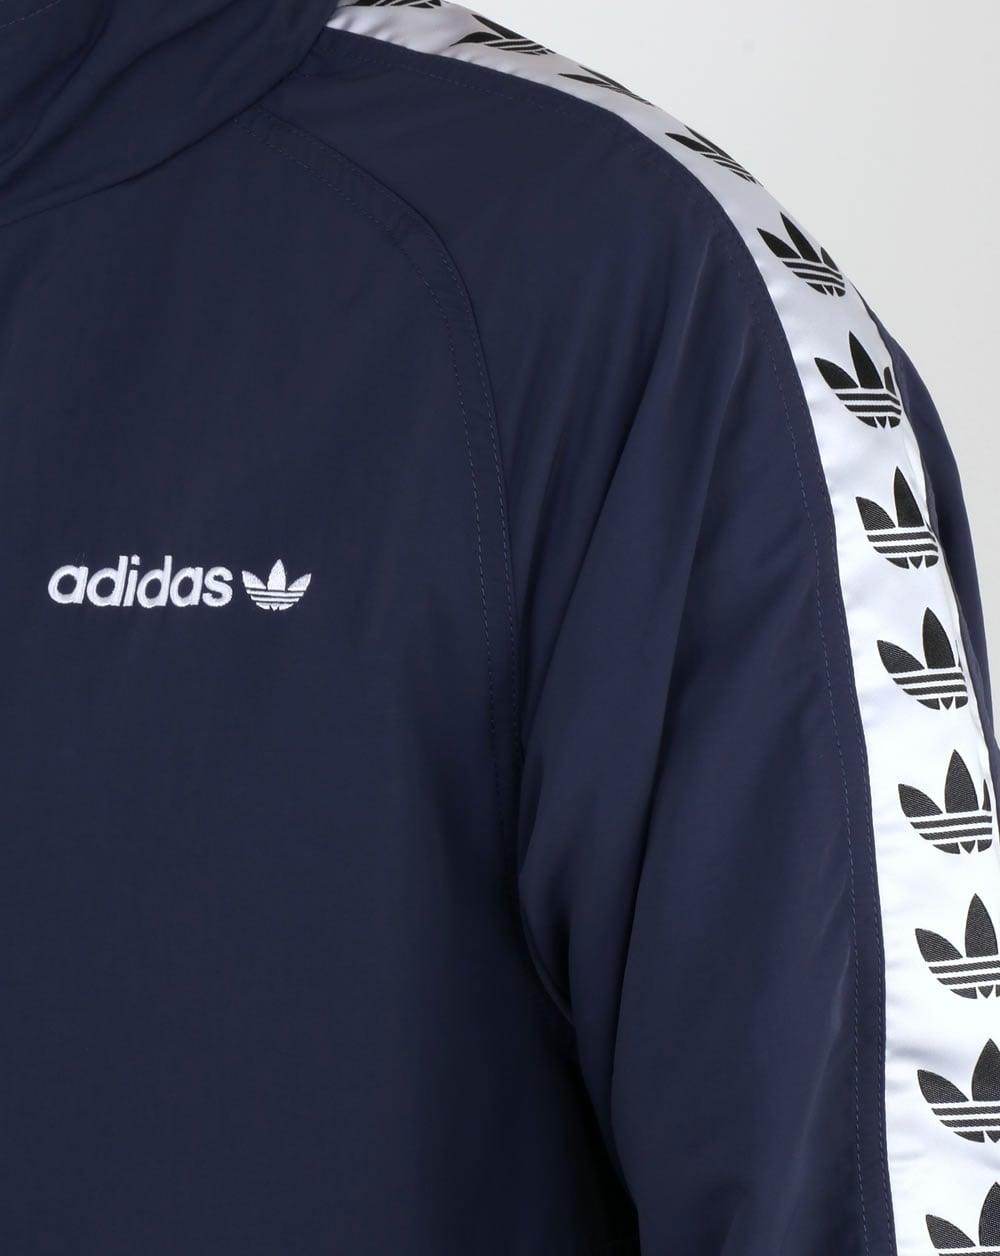 Adidas Originals Rain Jacket Sale Up To 36 Discounts